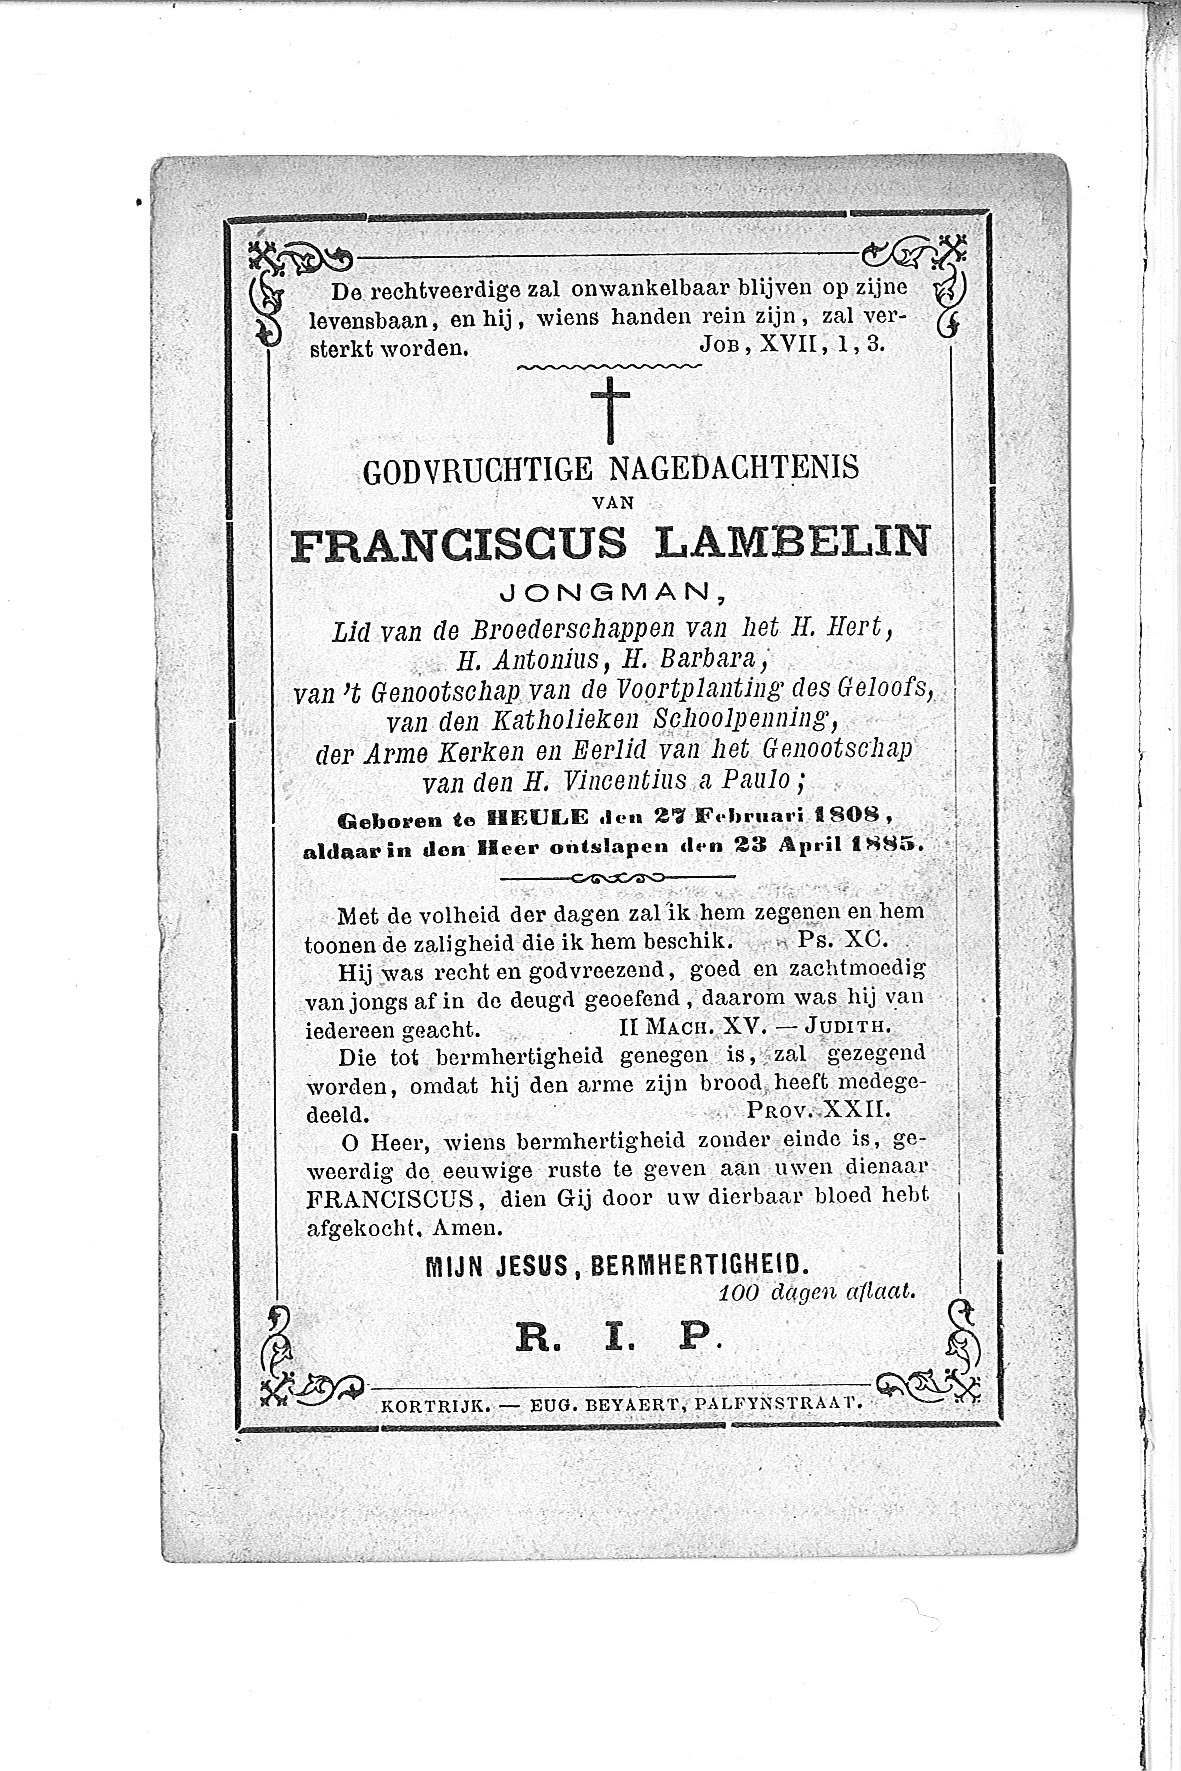 Franciscus20110405154136_00003.jpg